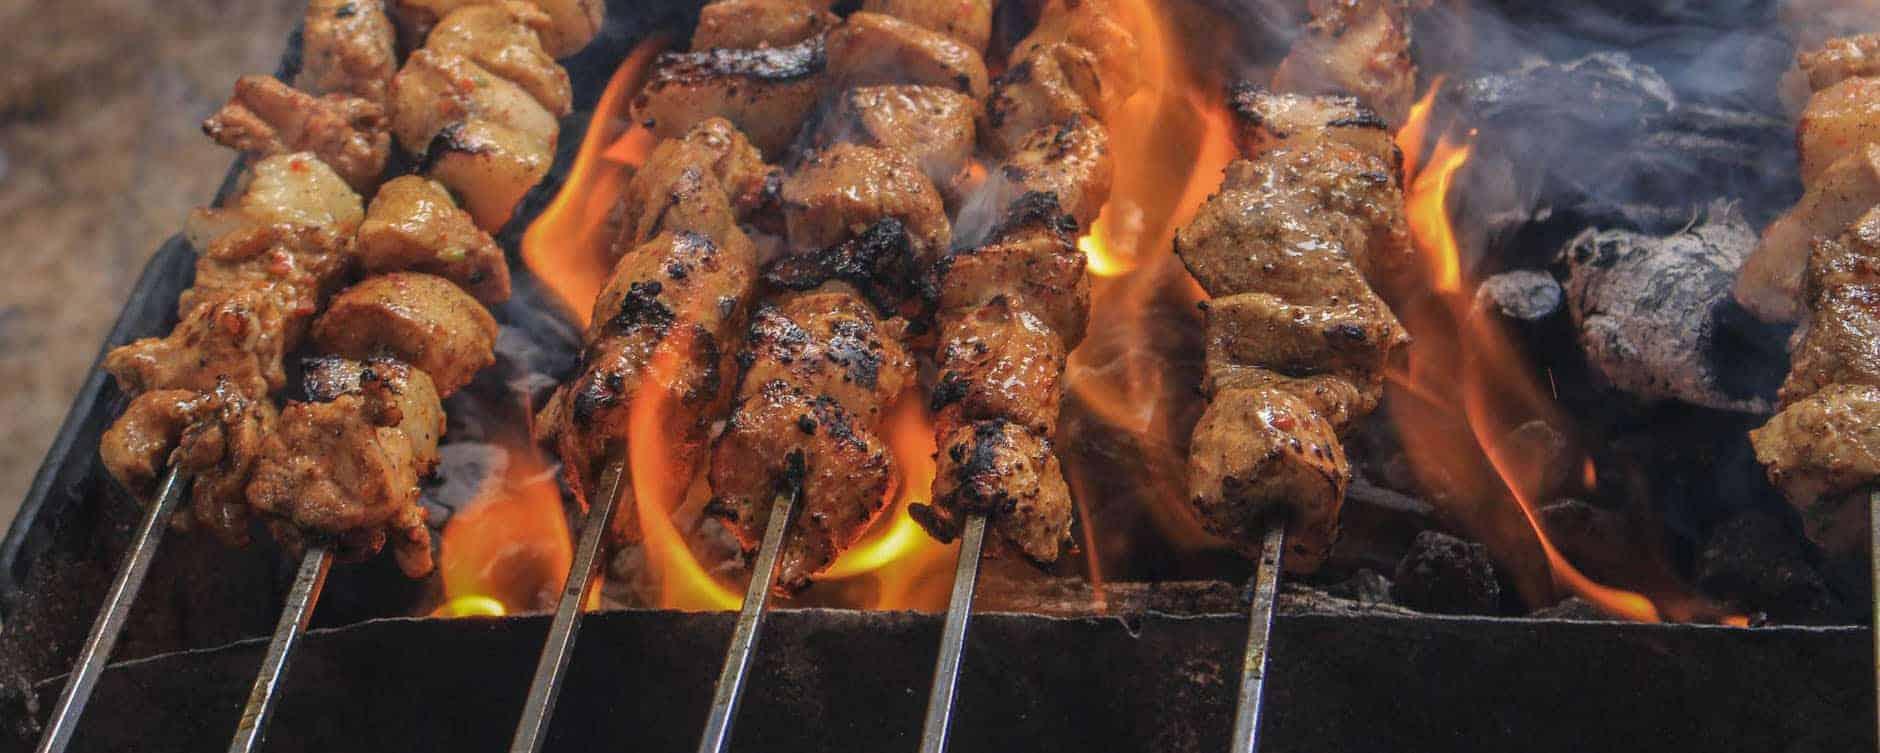 San Juan Barbecue Mansmith